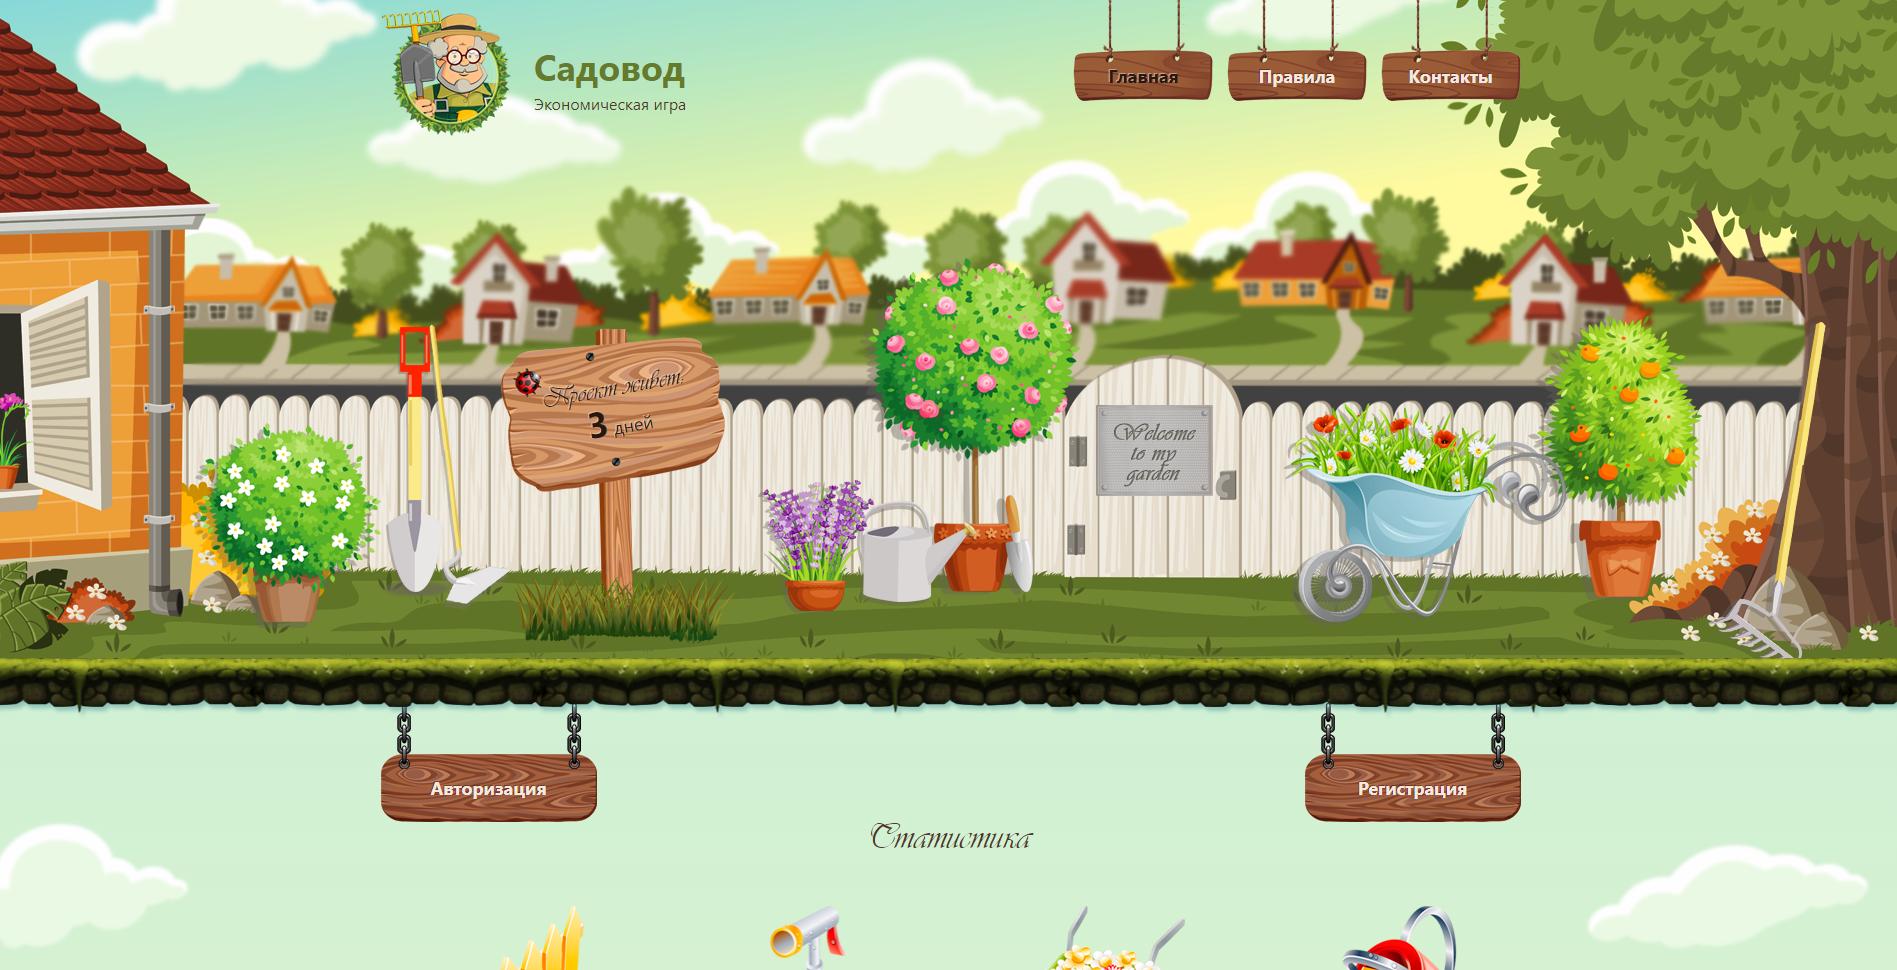 Gardeners Game - Gardeners-game.biz